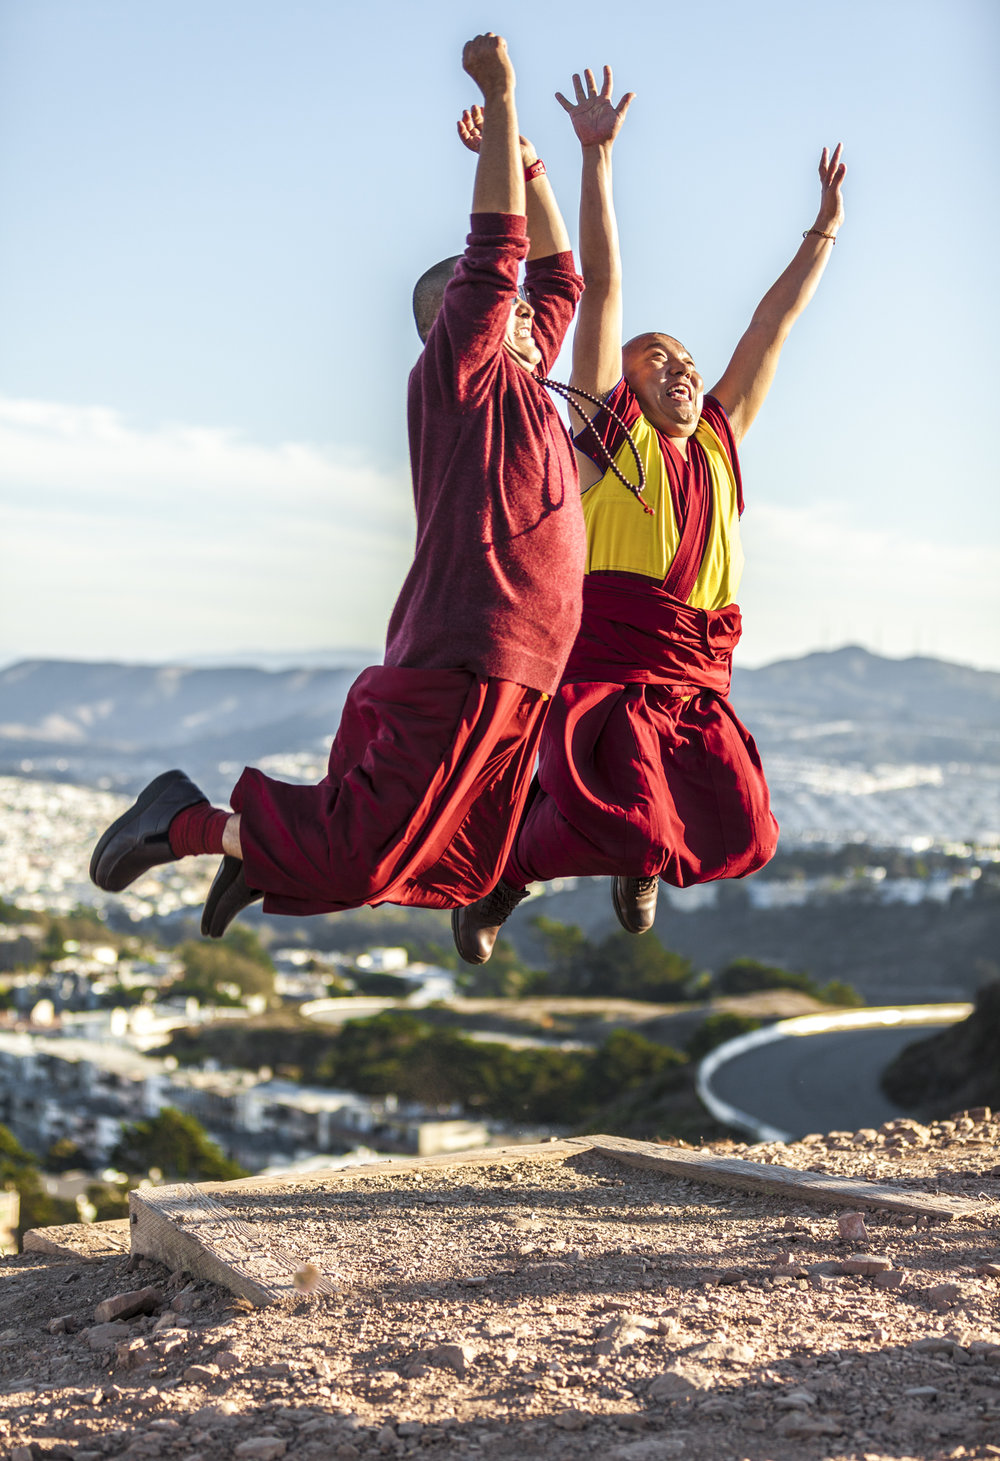 San-Francisco-Monks-Wes-Marsala-Twin-Peaks-46.jpg